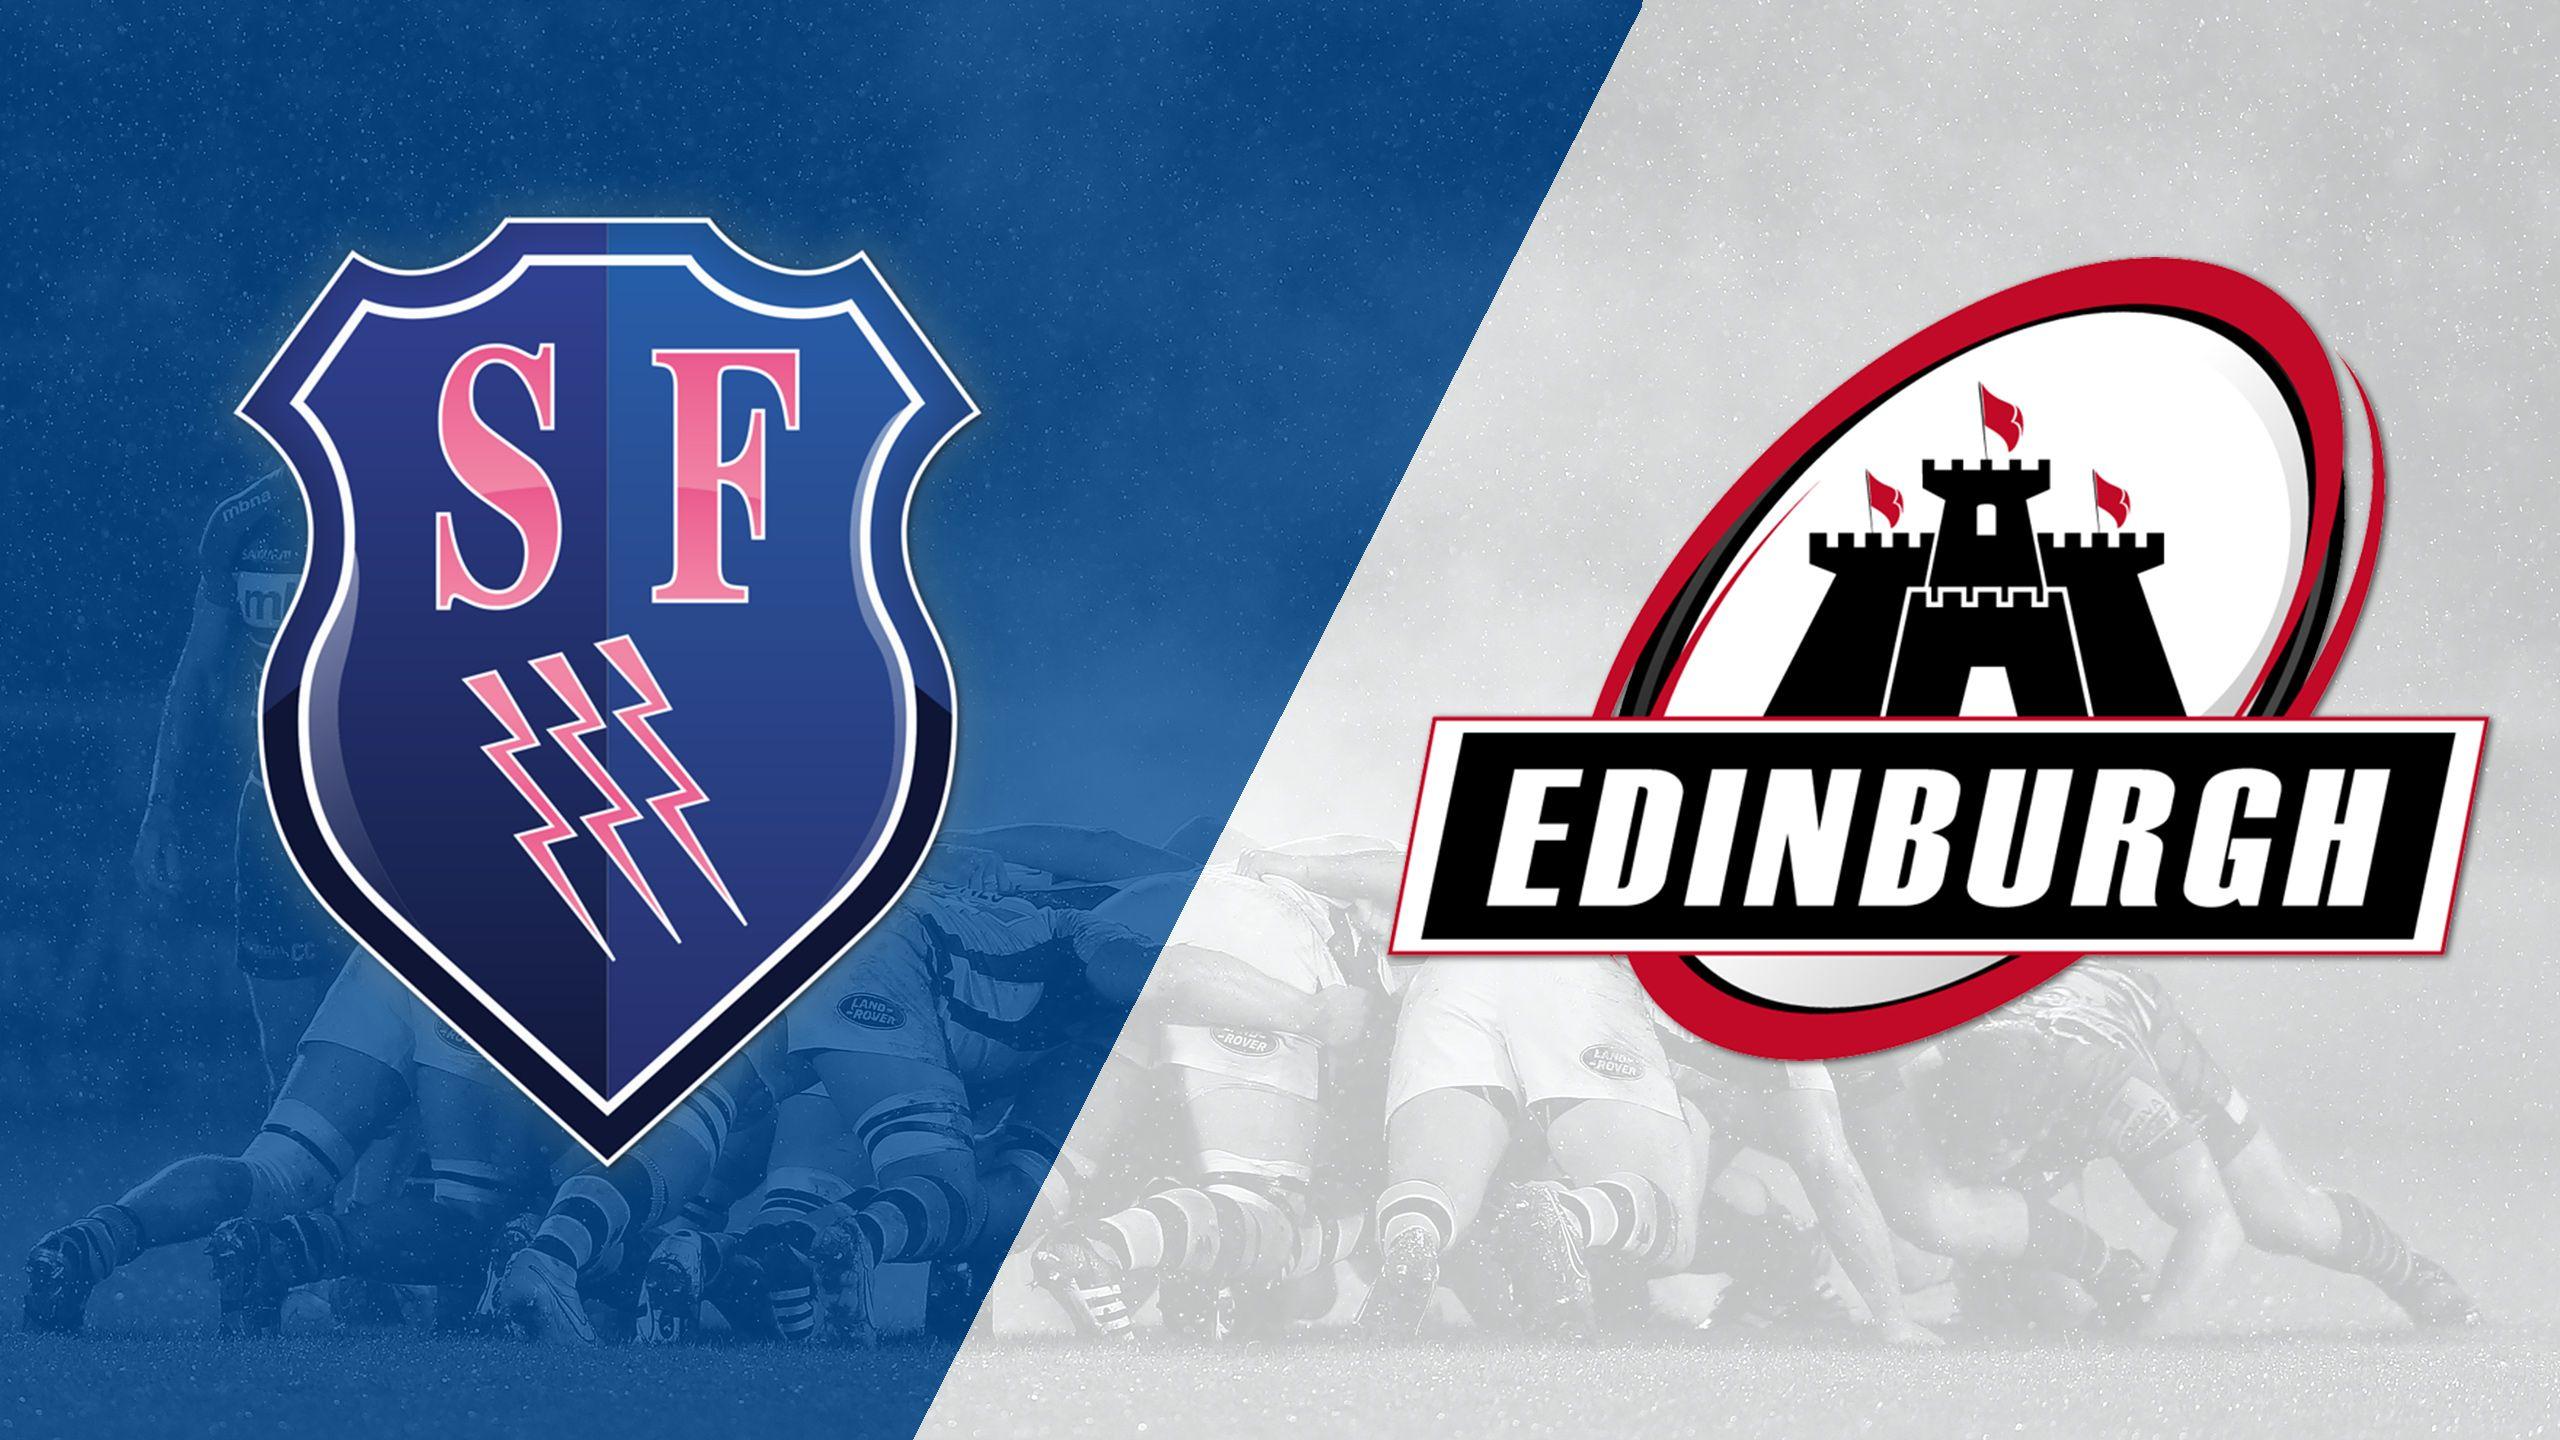 Stade Francais vs. Edinburgh (Round 6) (European Challenge Cup)